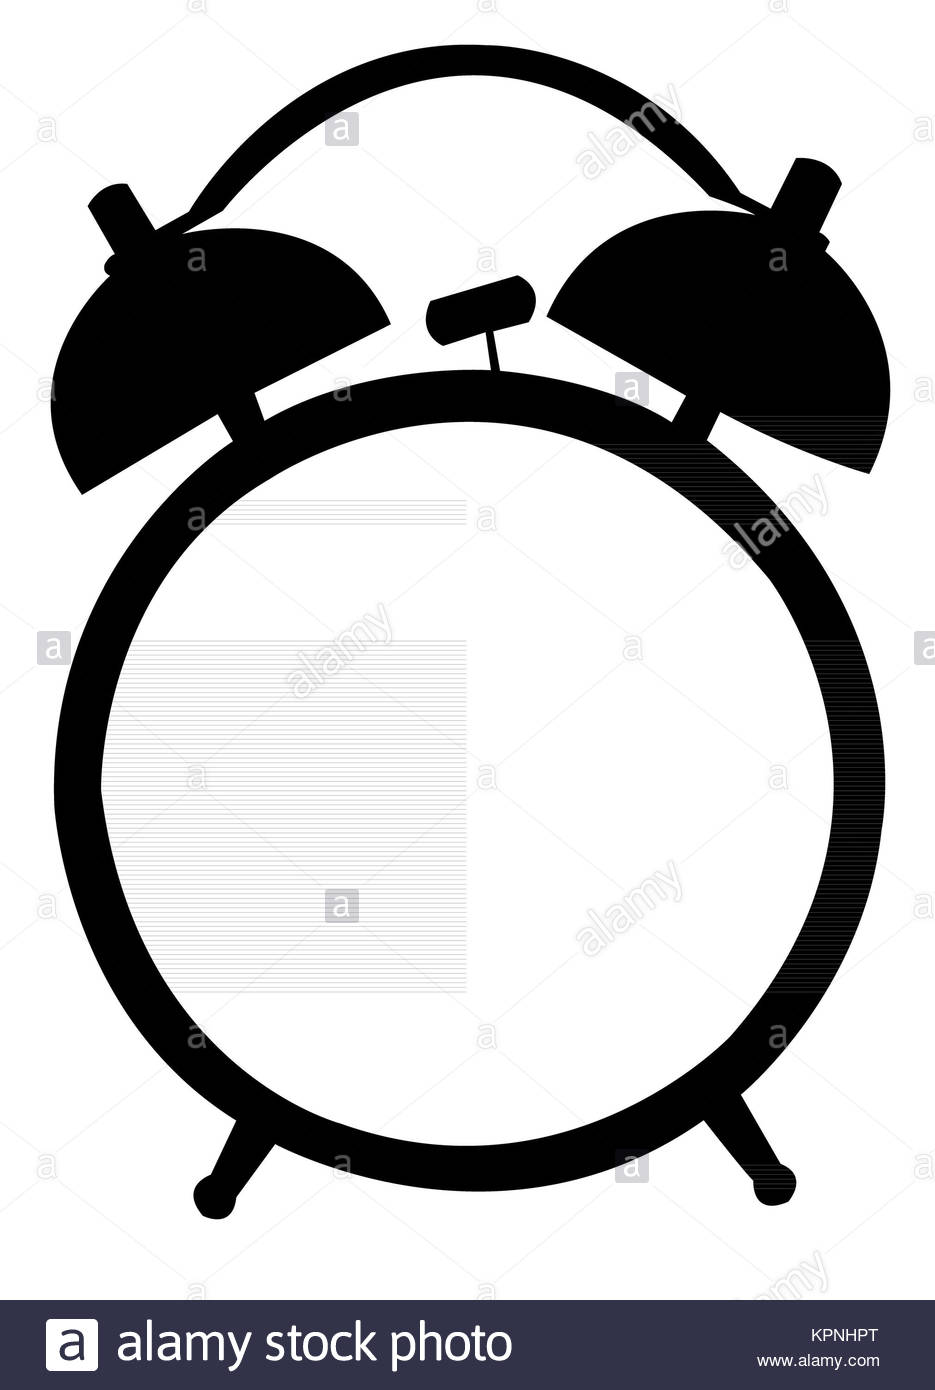 935x1390 Classic Alarm Clock. Silhouette, Black On White Stock Photo